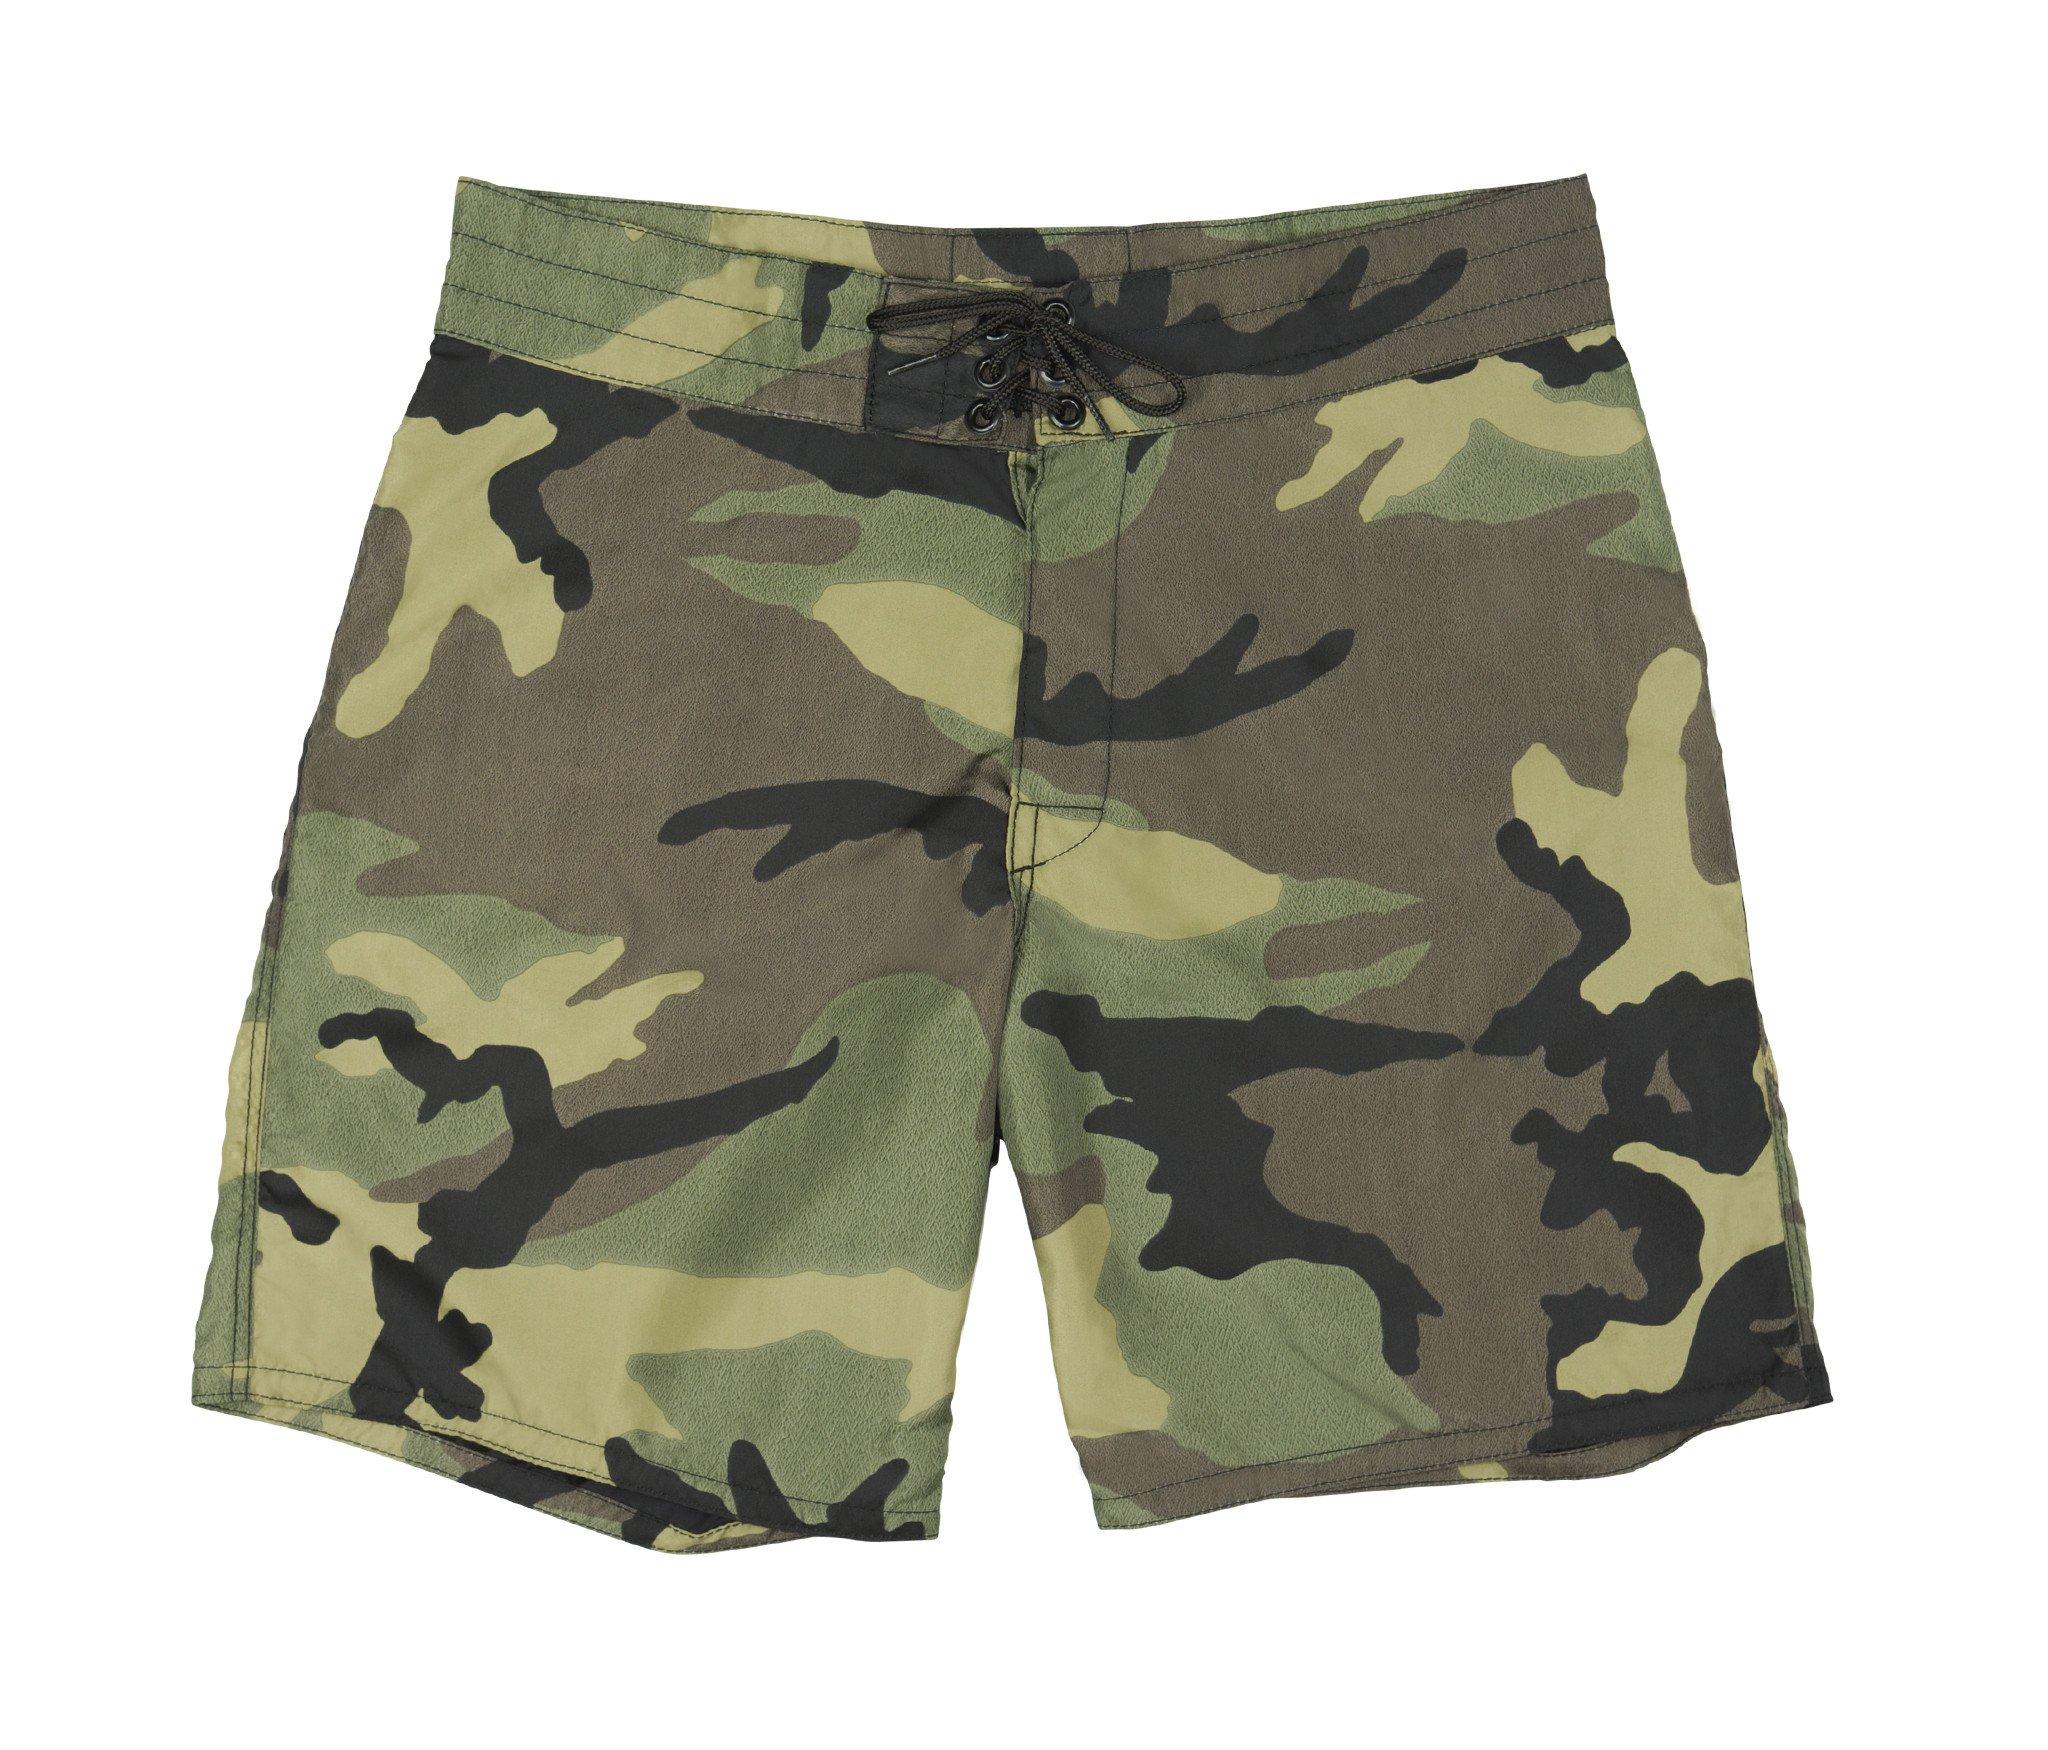 4f253bbeac7 Galleon - Birdwell Beach Britches Style 311 (Camouflage, 38)